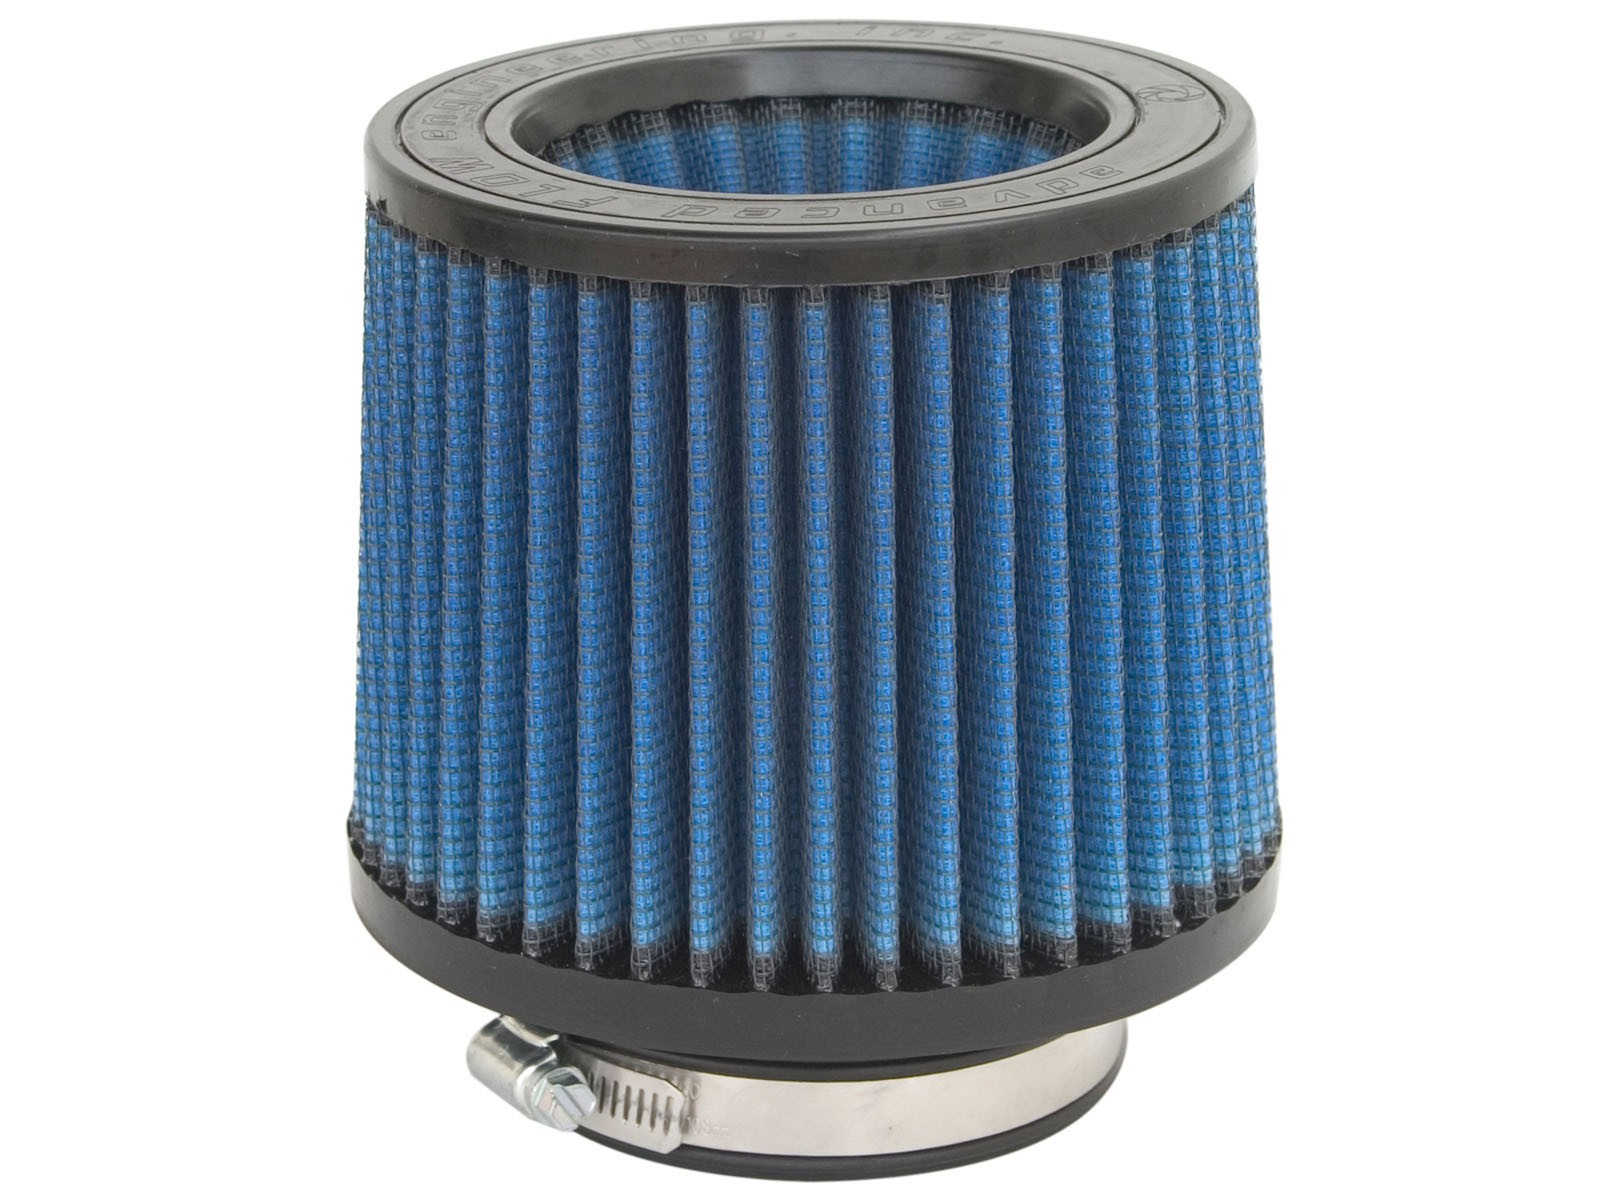 aFe POWER 24-91016 Magnum FLOW Pro 5R Air Filter